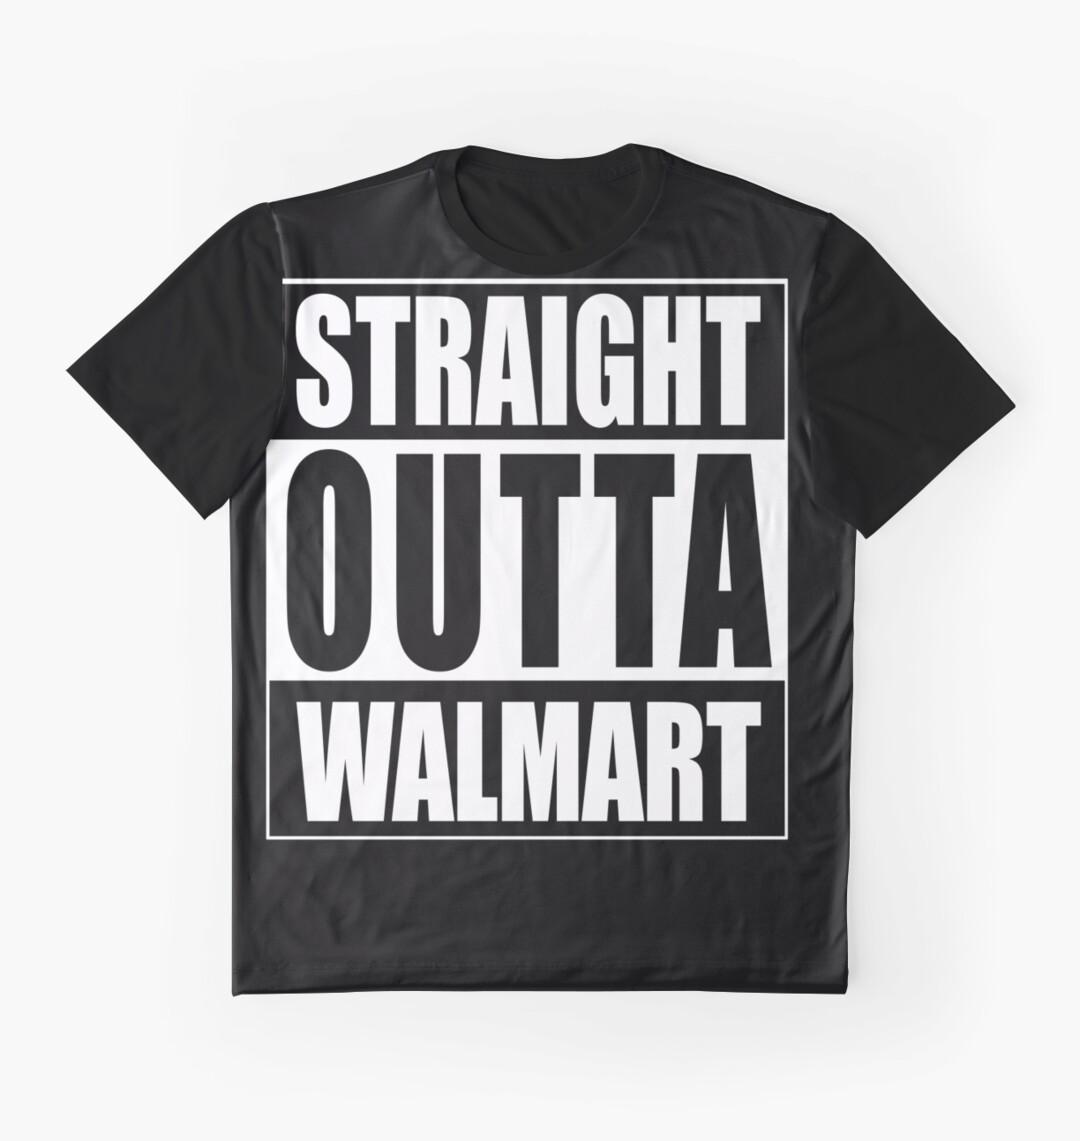 Straight outta walmart graphic t shirts